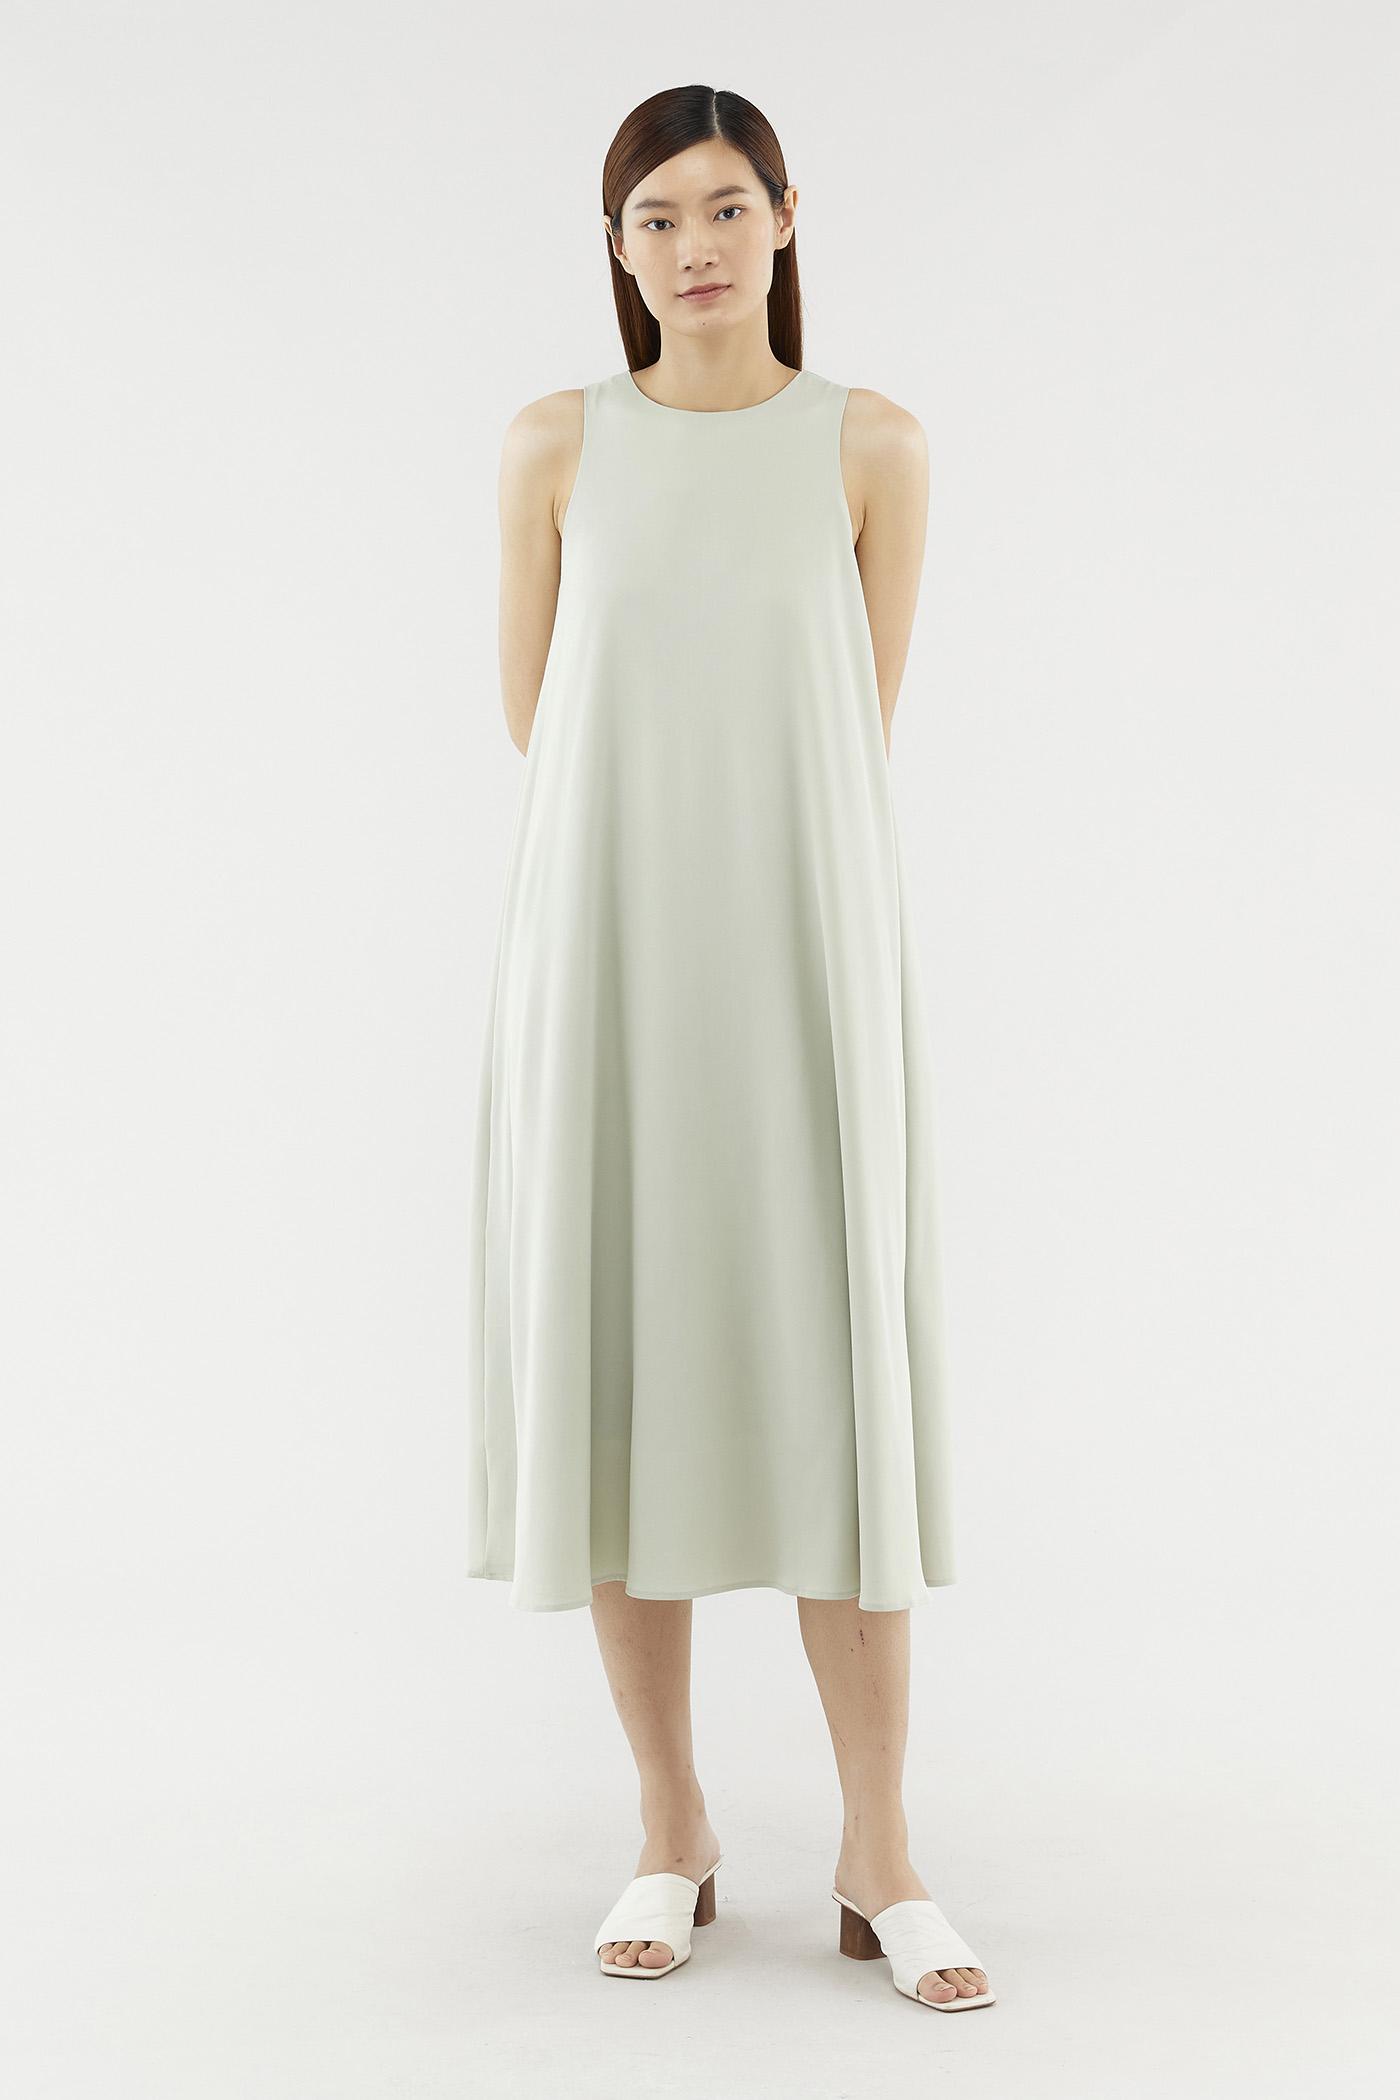 Lyrica Tent Dress